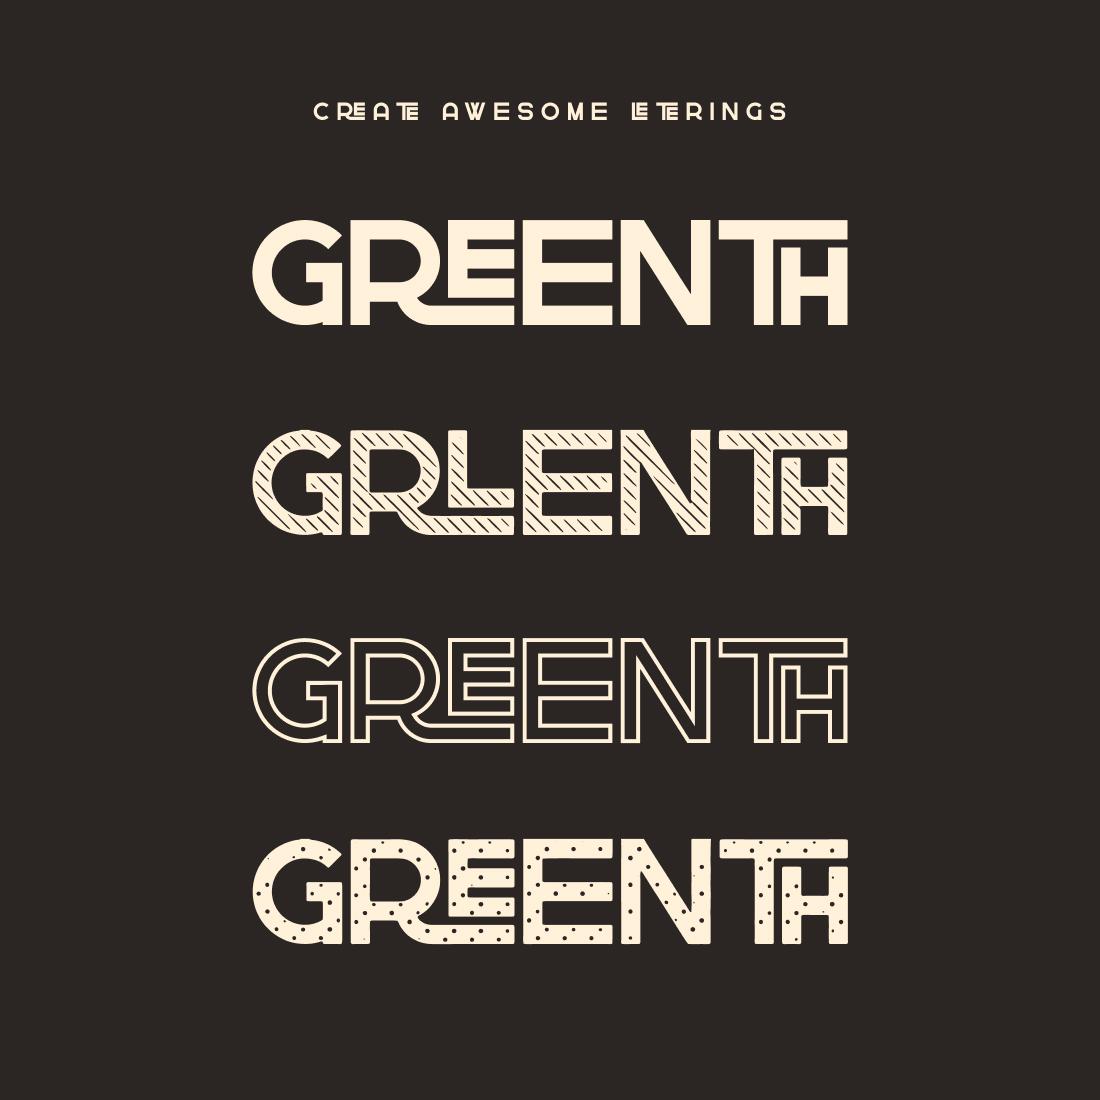 Greenth Display Latin Cyrillic Font cover image.